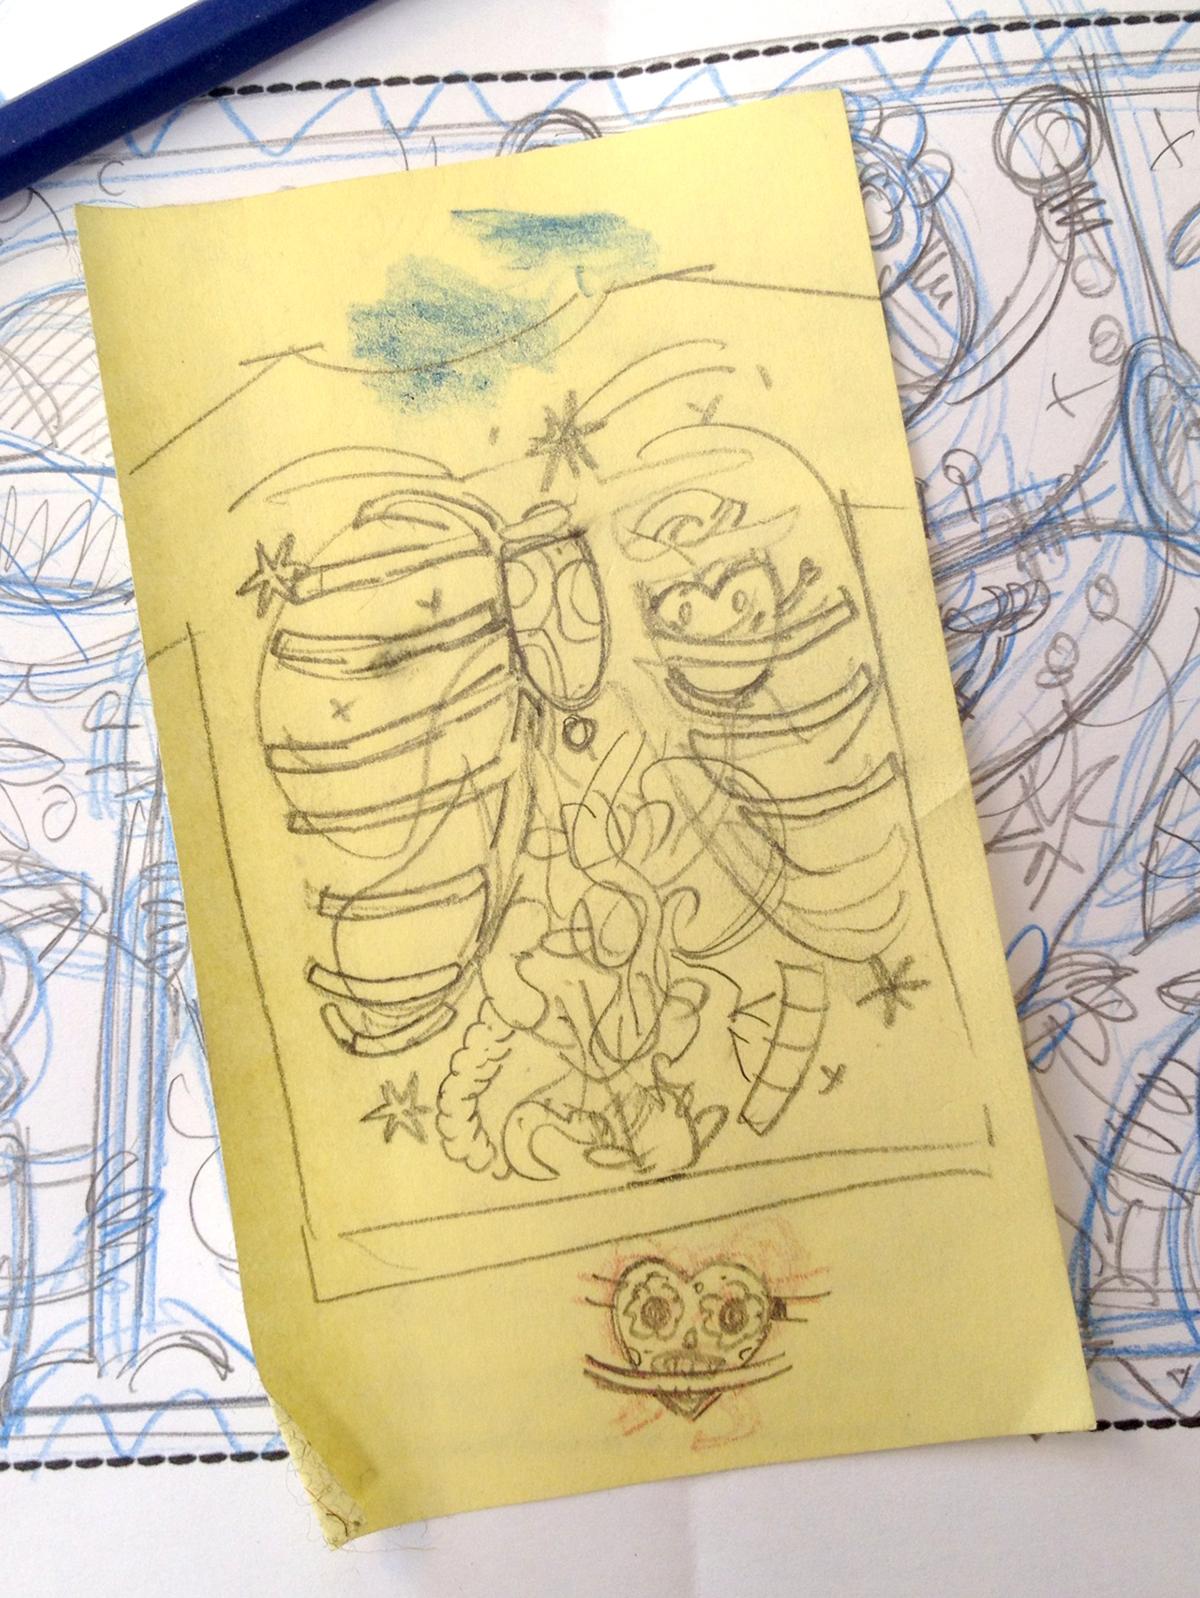 day of the dead anatomy skeleton dia de los muertos bones hand drawn type chest